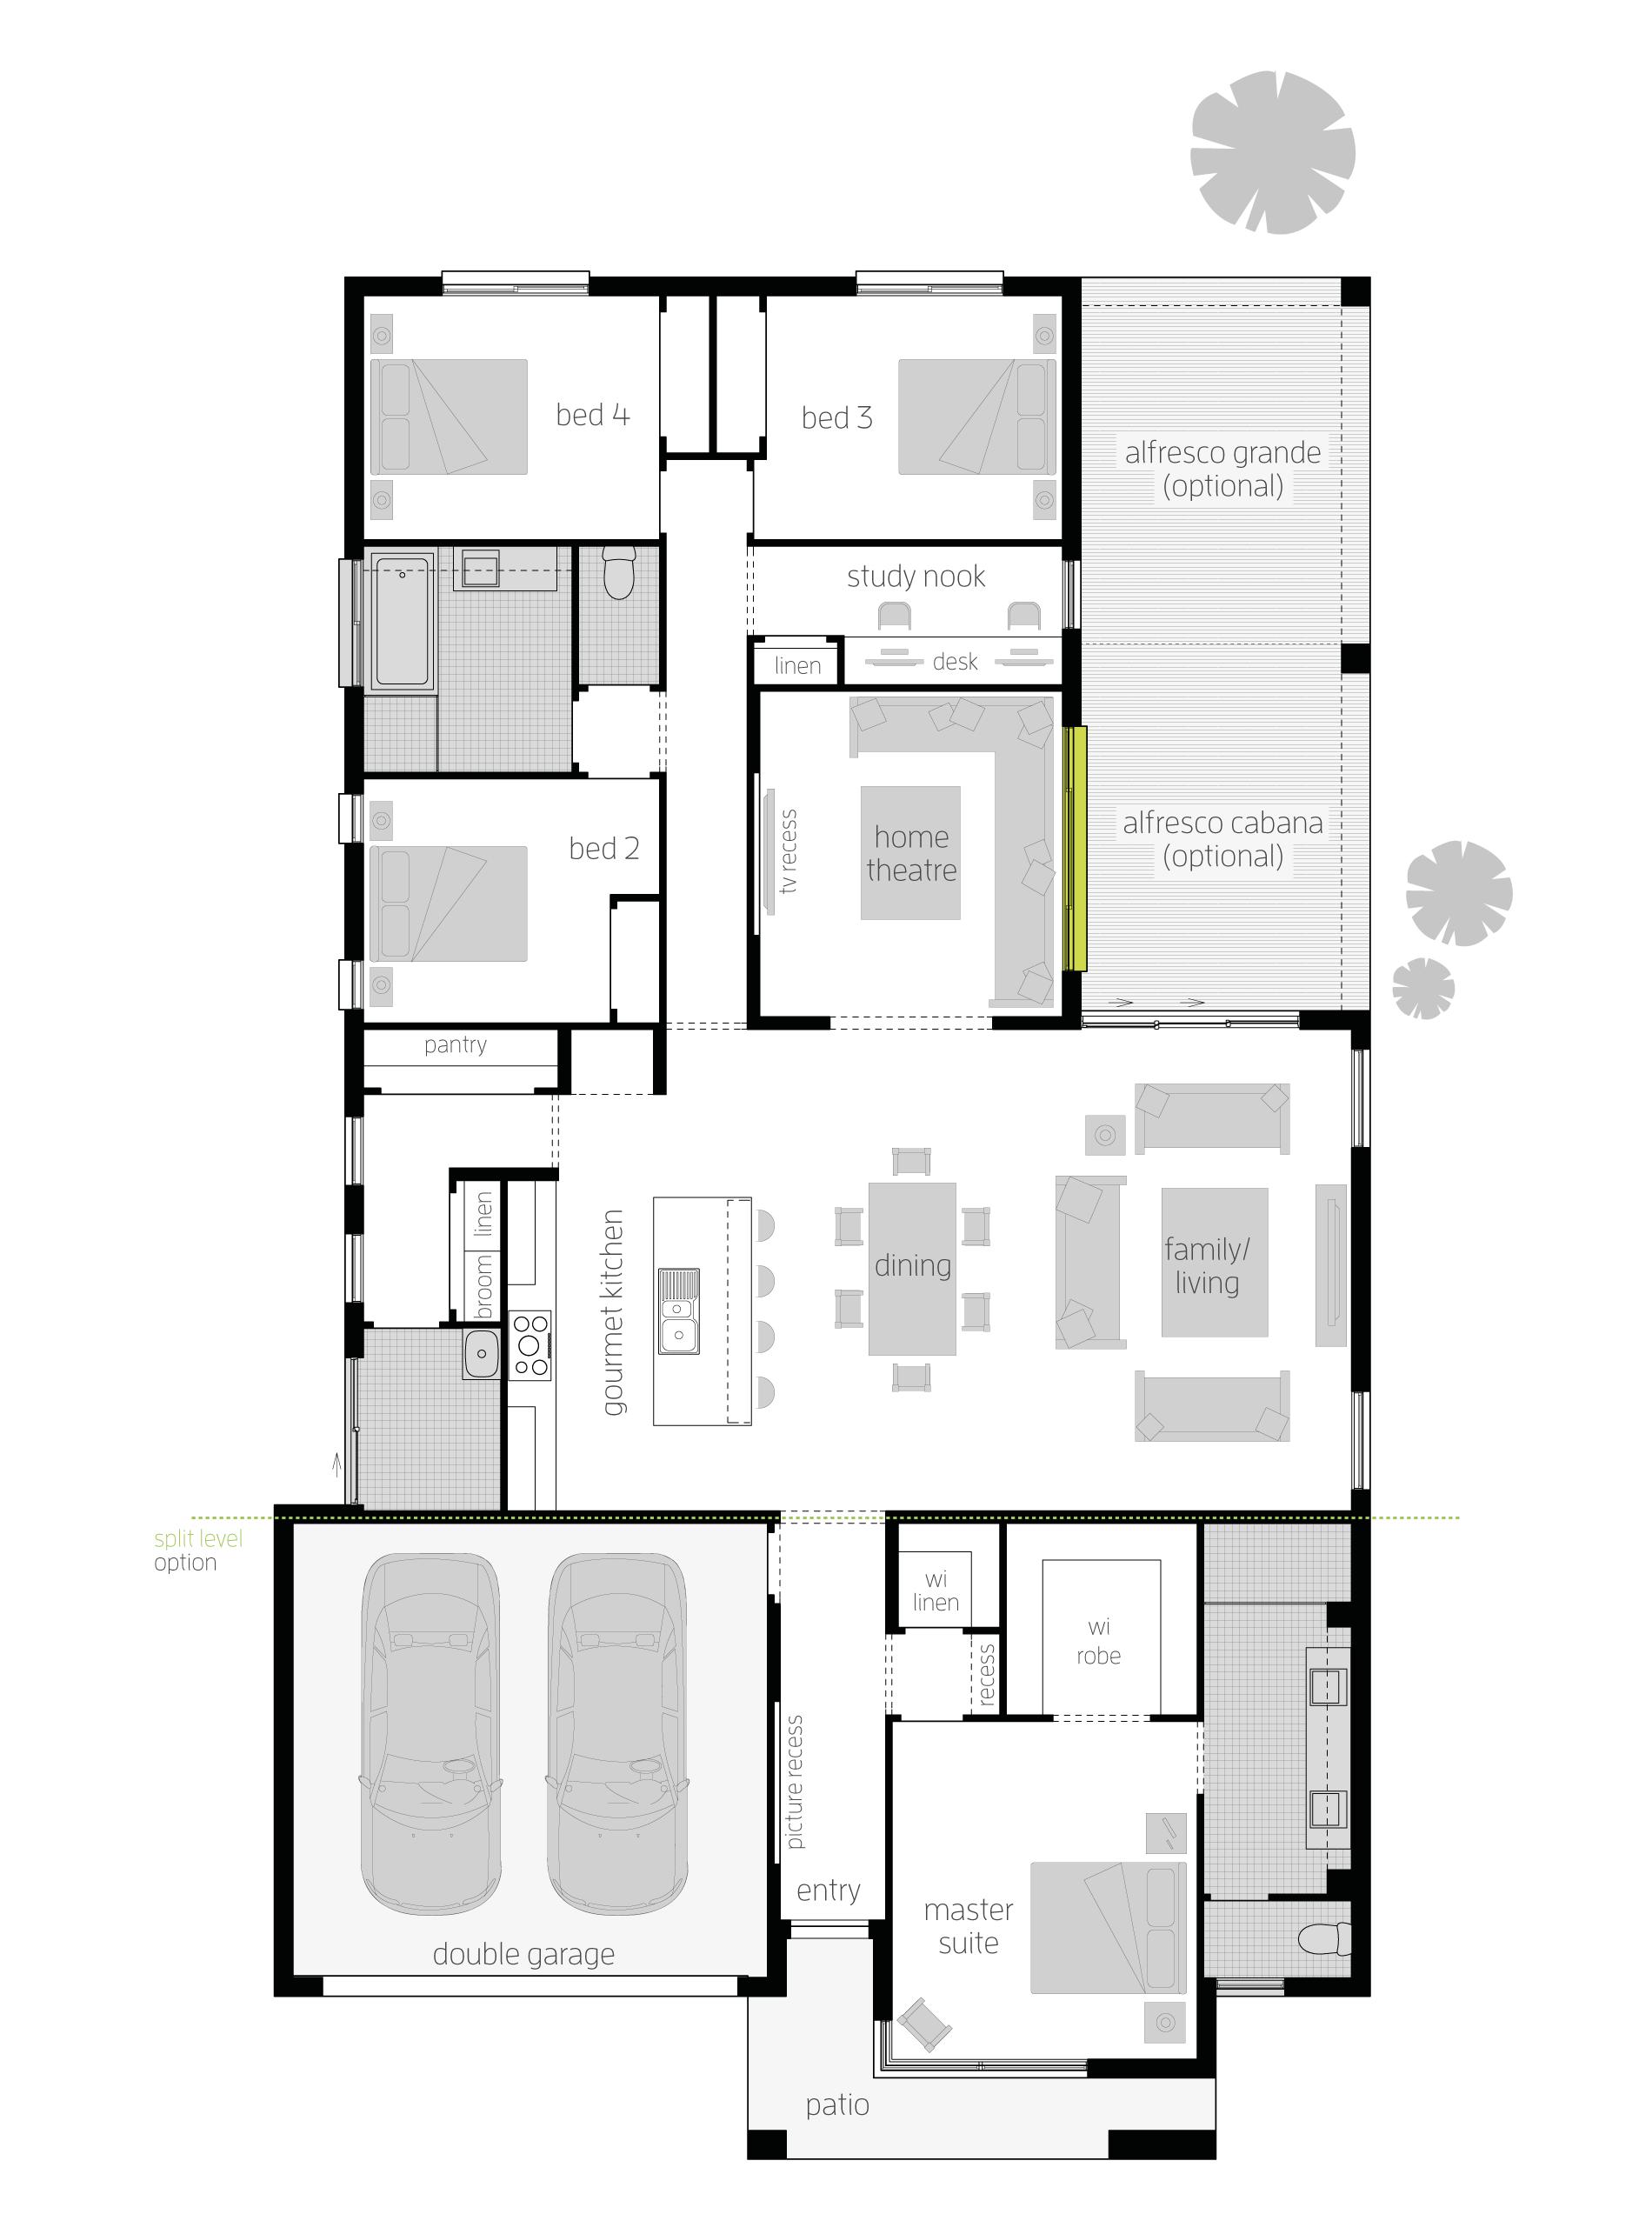 Broadbeach Zero Floor Plan Simple Small House Plans In 2018 Plan